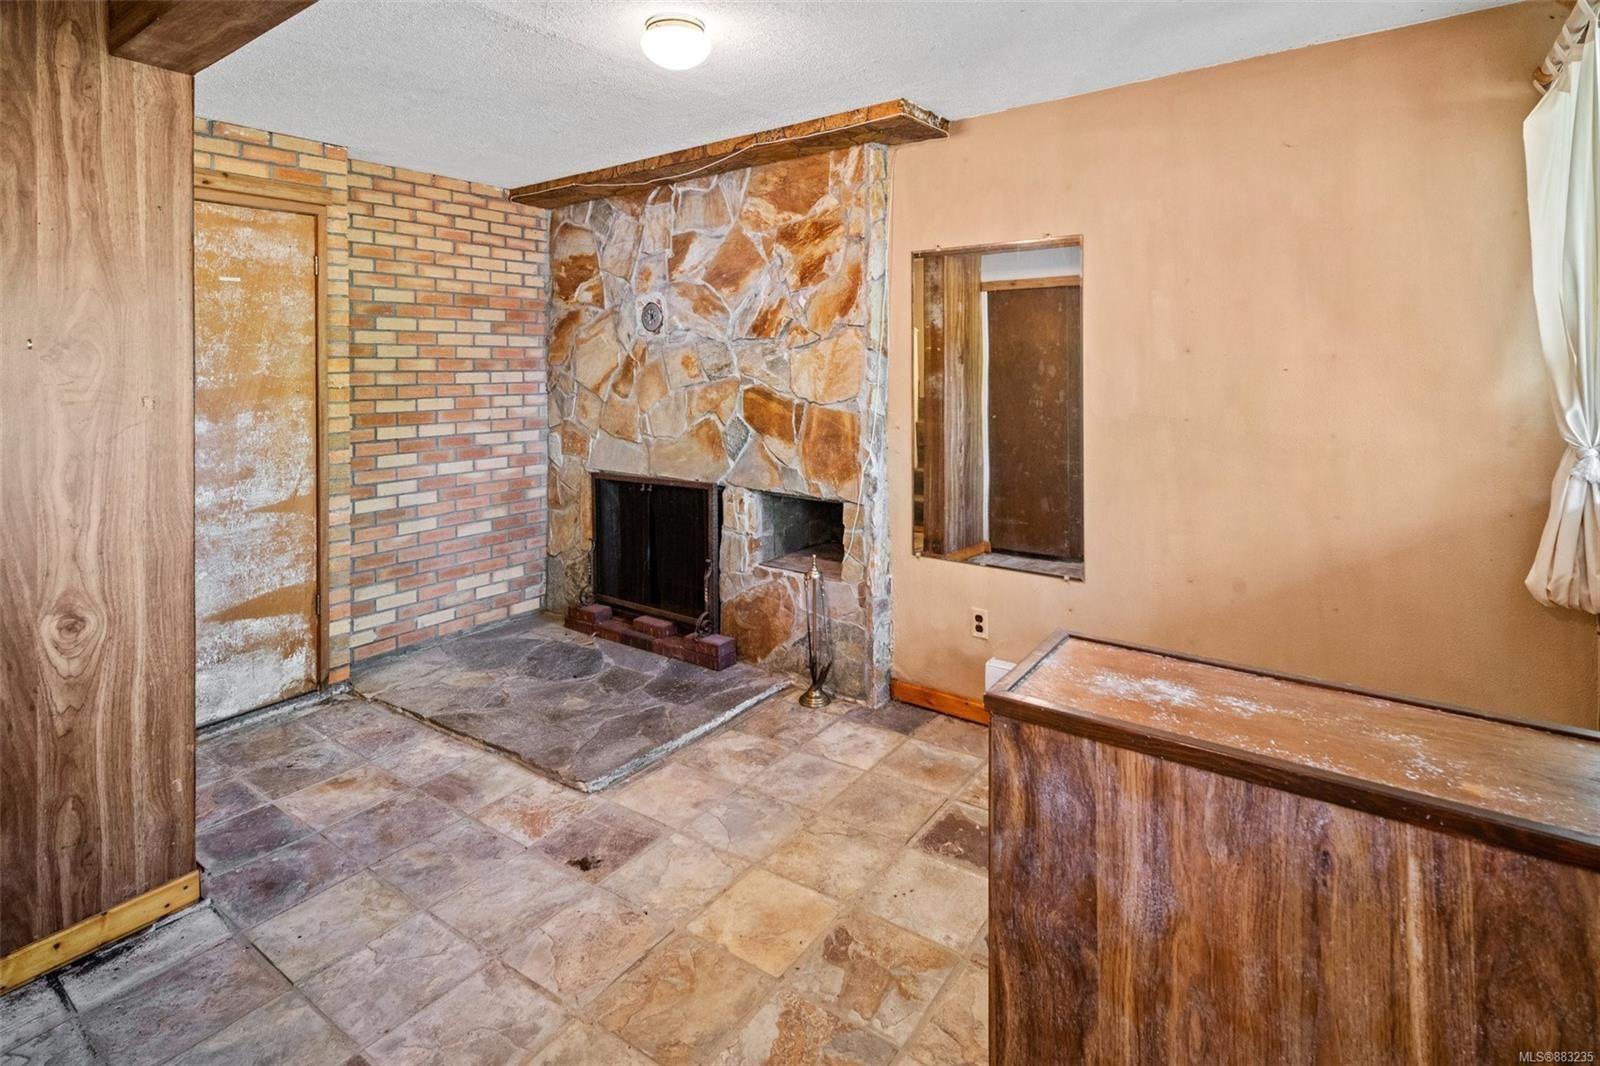 Photo 22: Photos: 6542 Thornett Rd in : Sk East Sooke House for sale (Sooke)  : MLS®# 883235